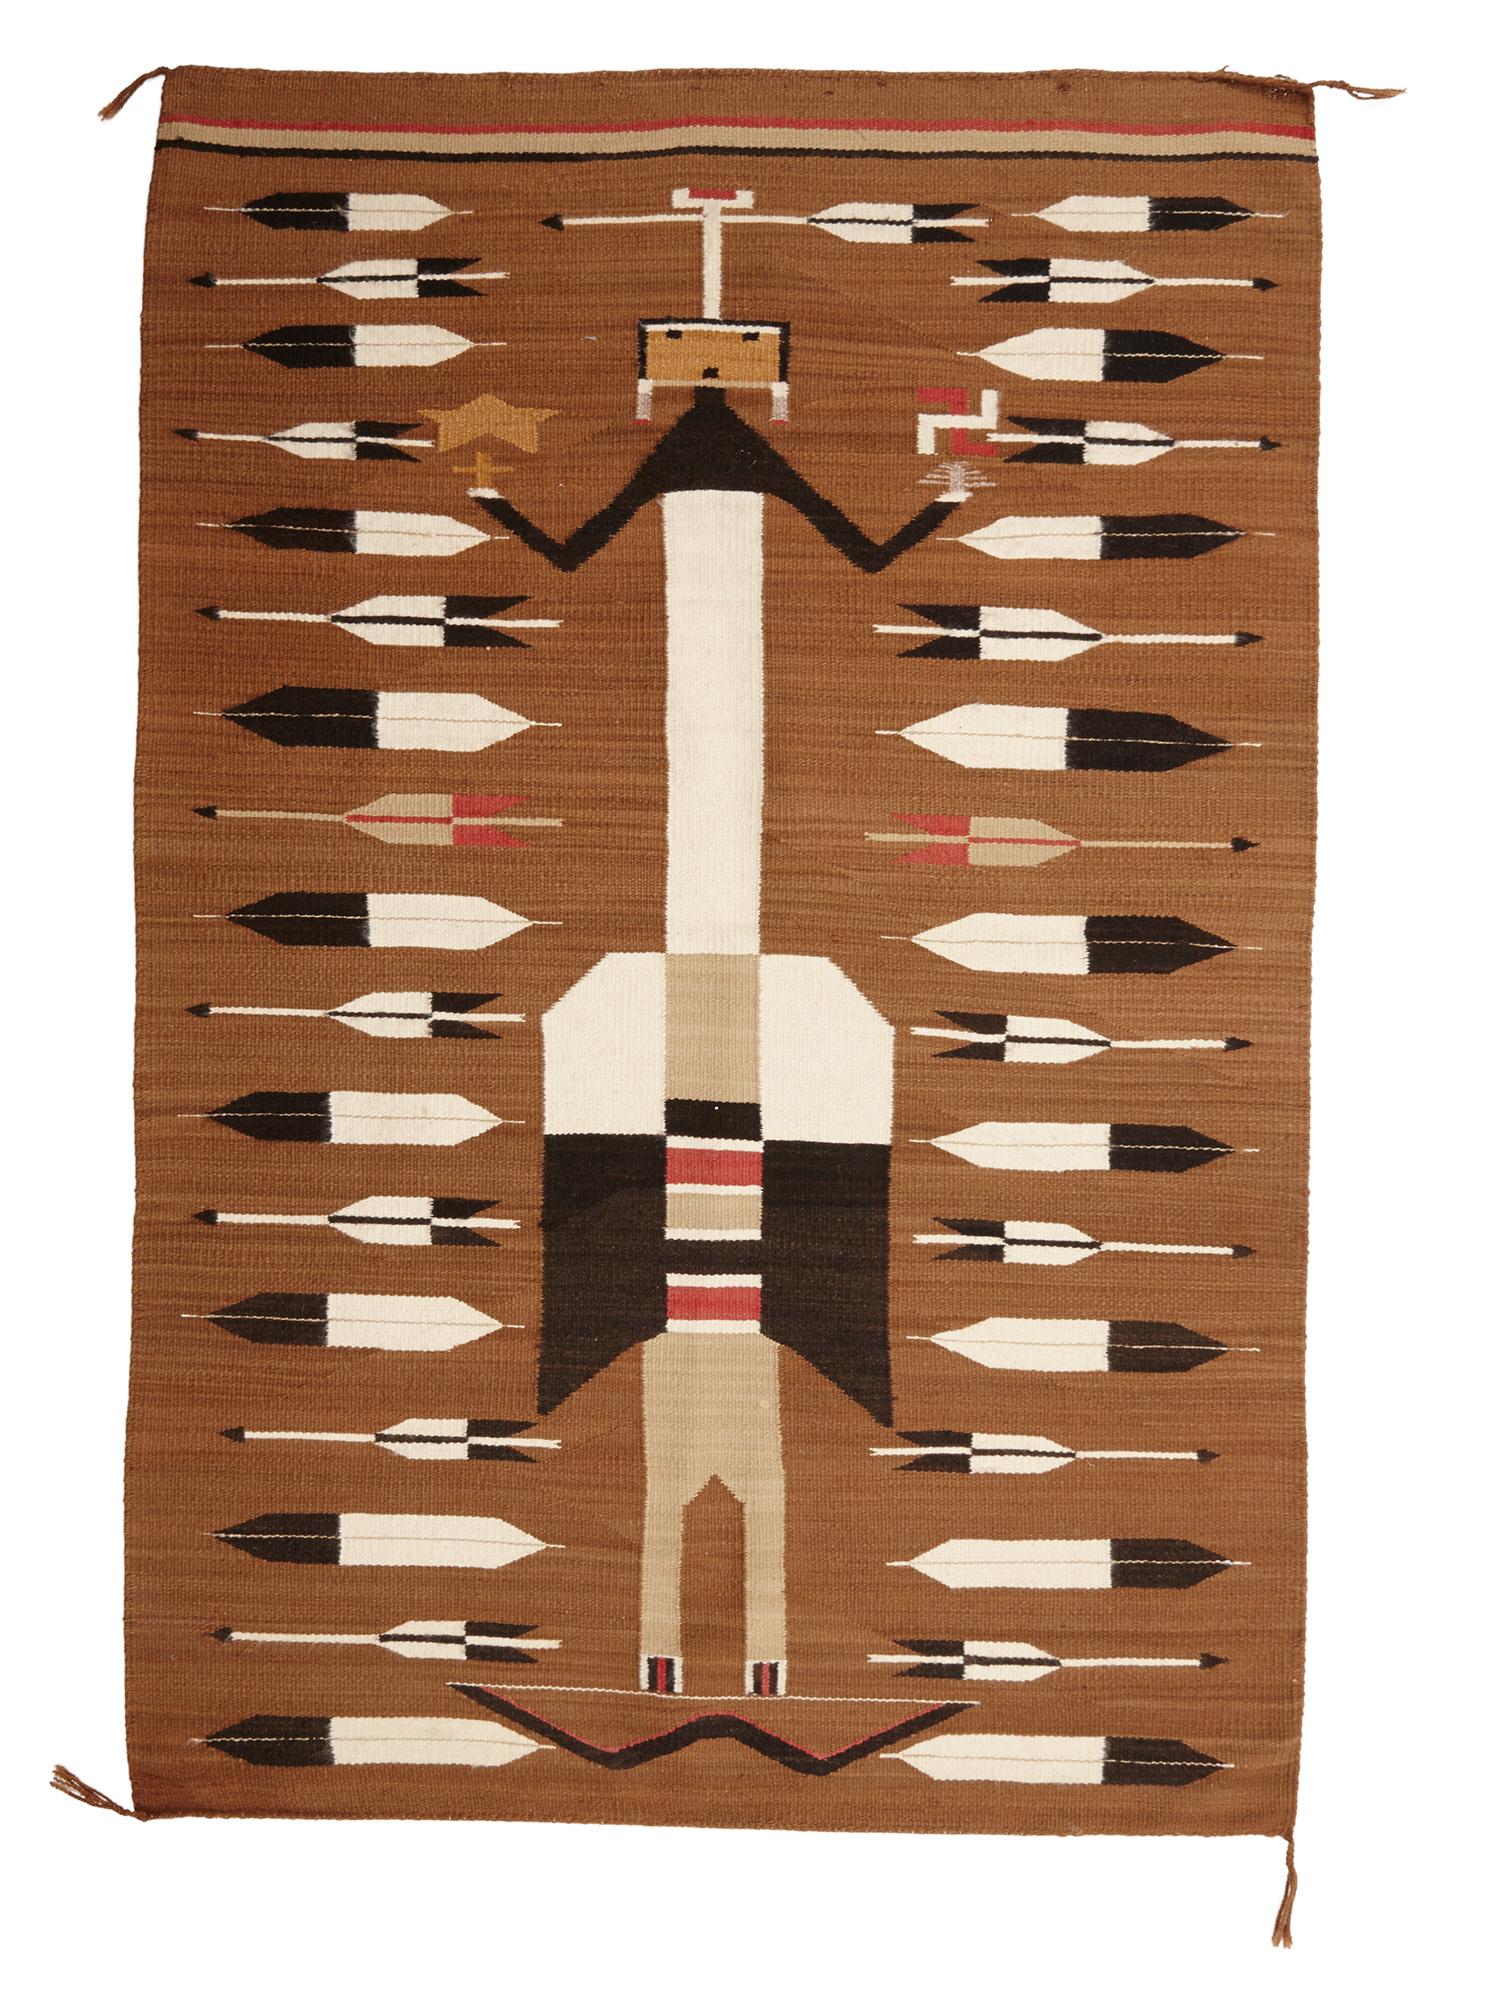 Important Oceanic & African Art, 14 September 2013, Webb's, Auckland Lot 312, Navajo rug, Arizona, USA.